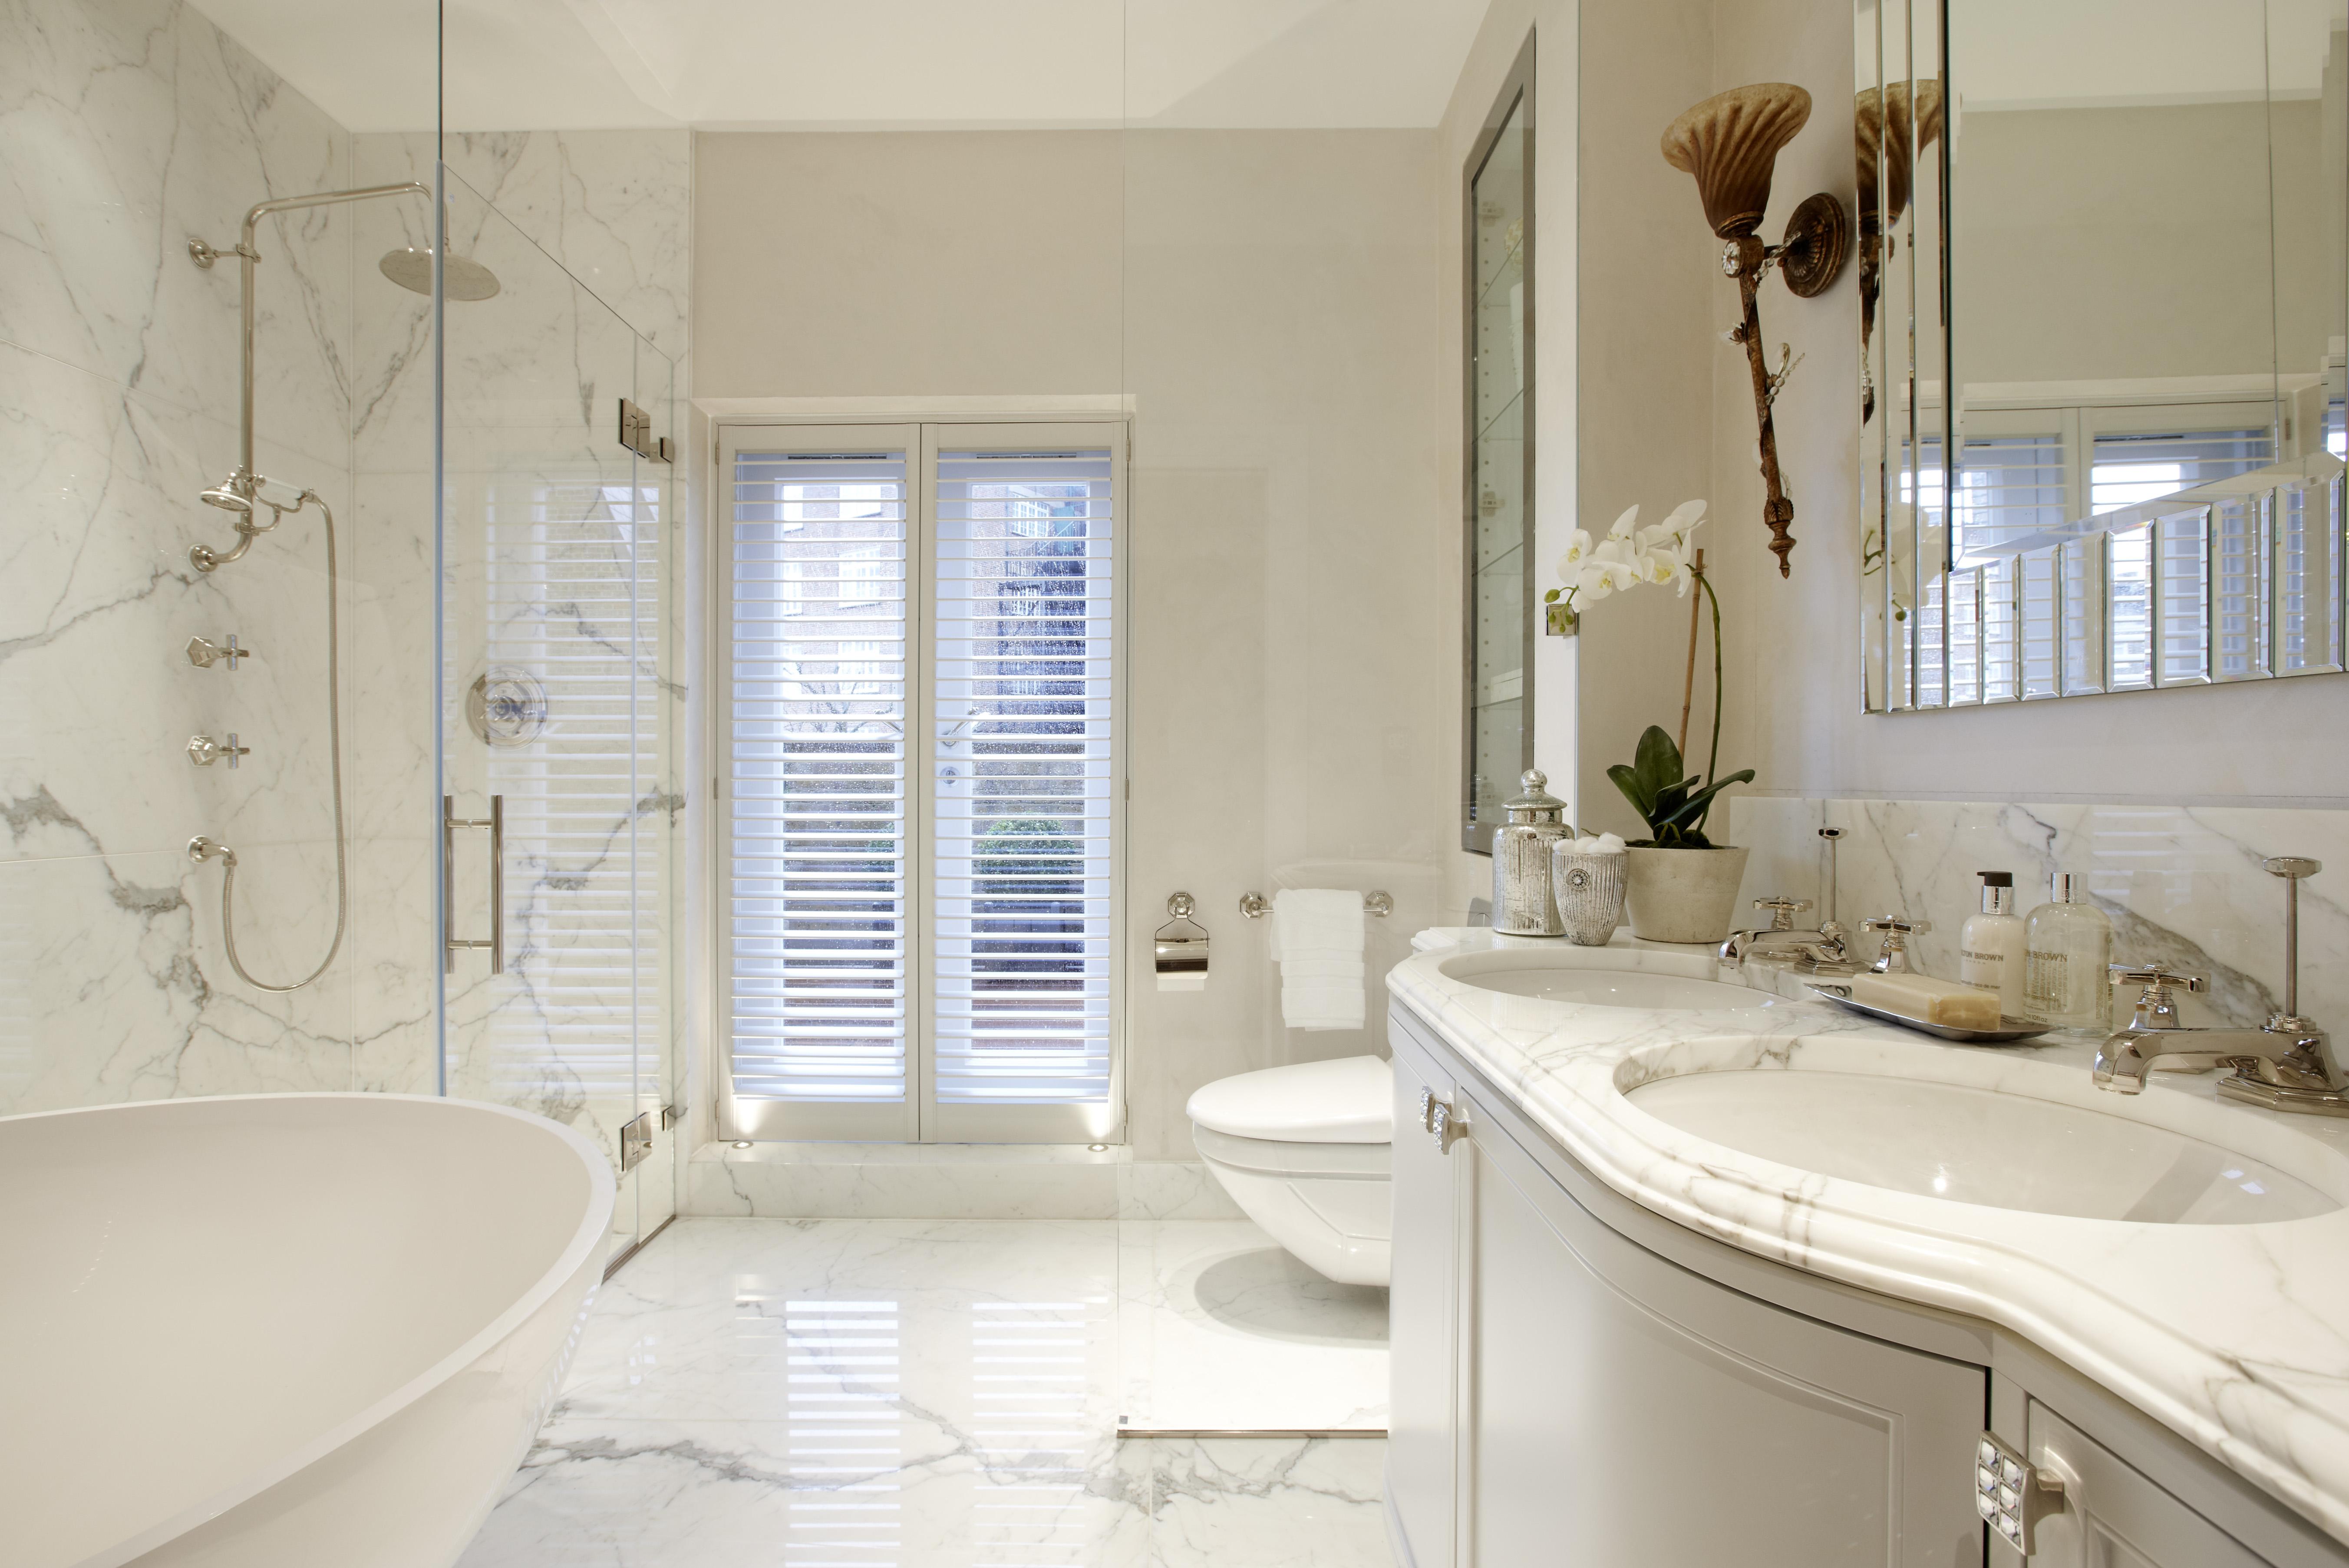 Beautiful bathrooms: How to design your lighting, draw the ... on Beautiful Bathroom Ideas  id=29459